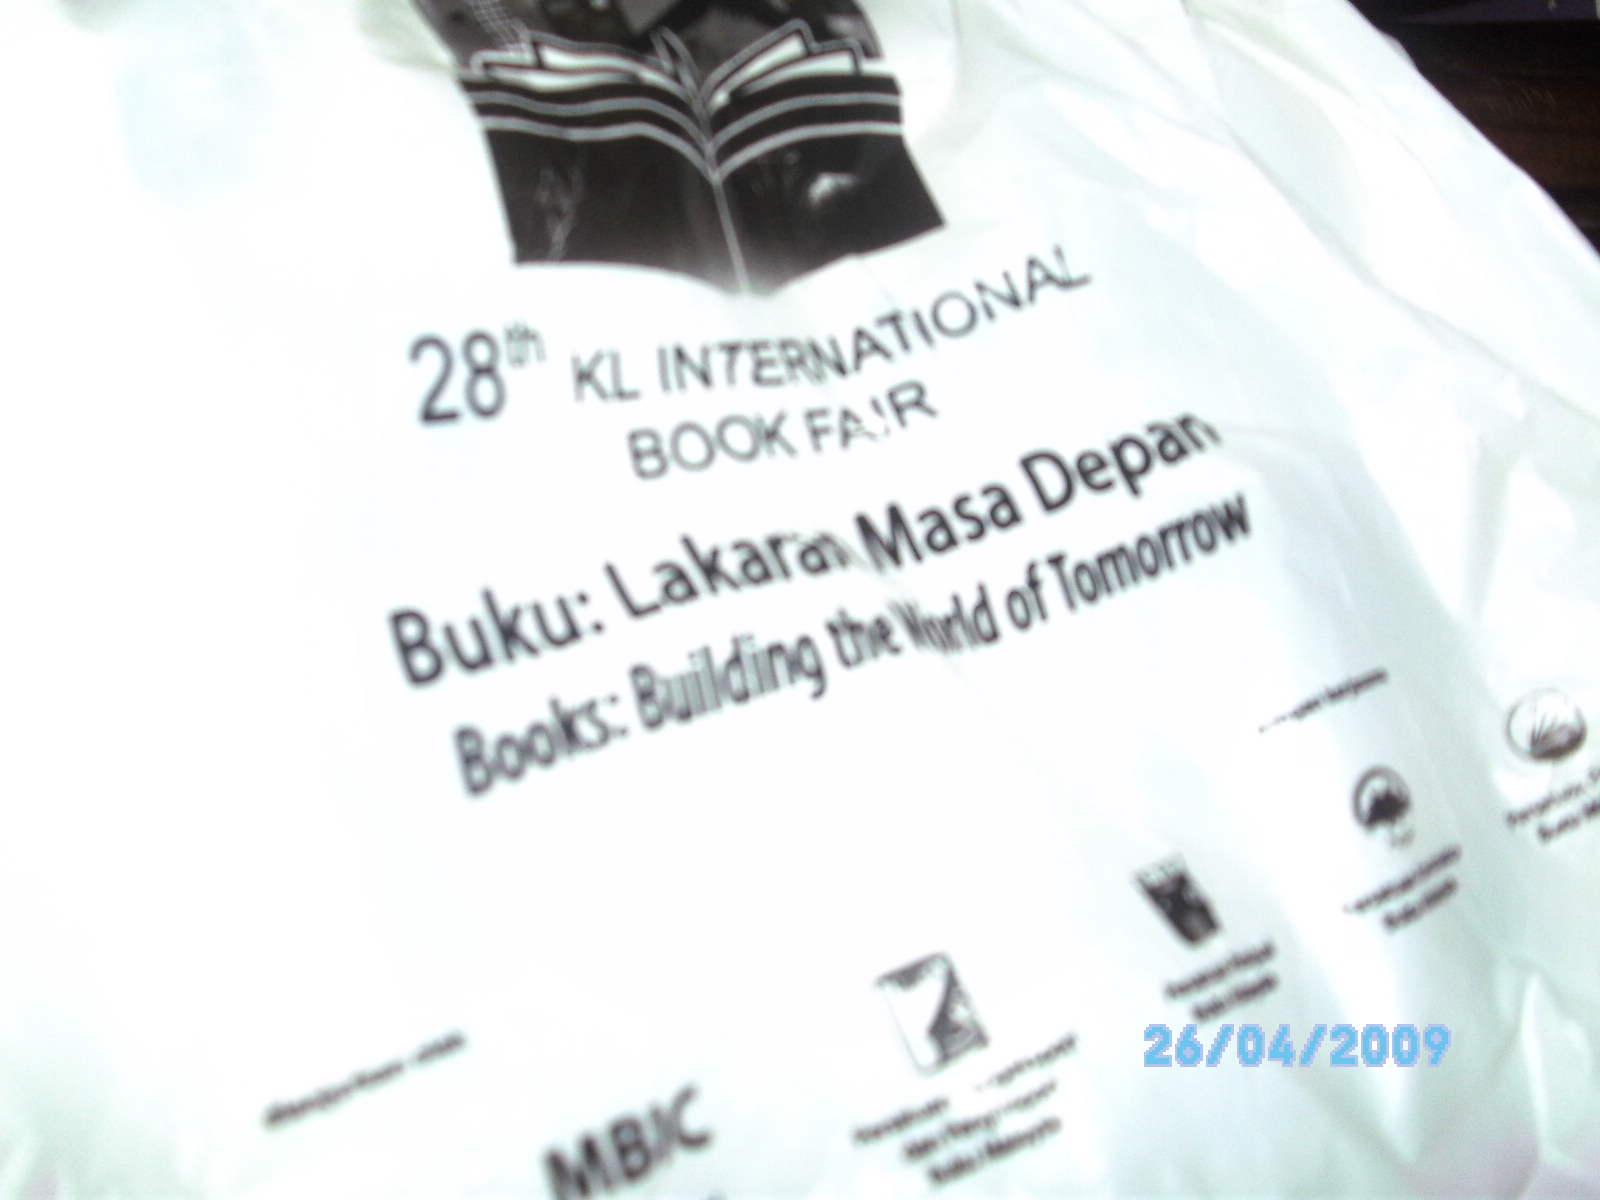 Beg plastik rasmi PBAKL09